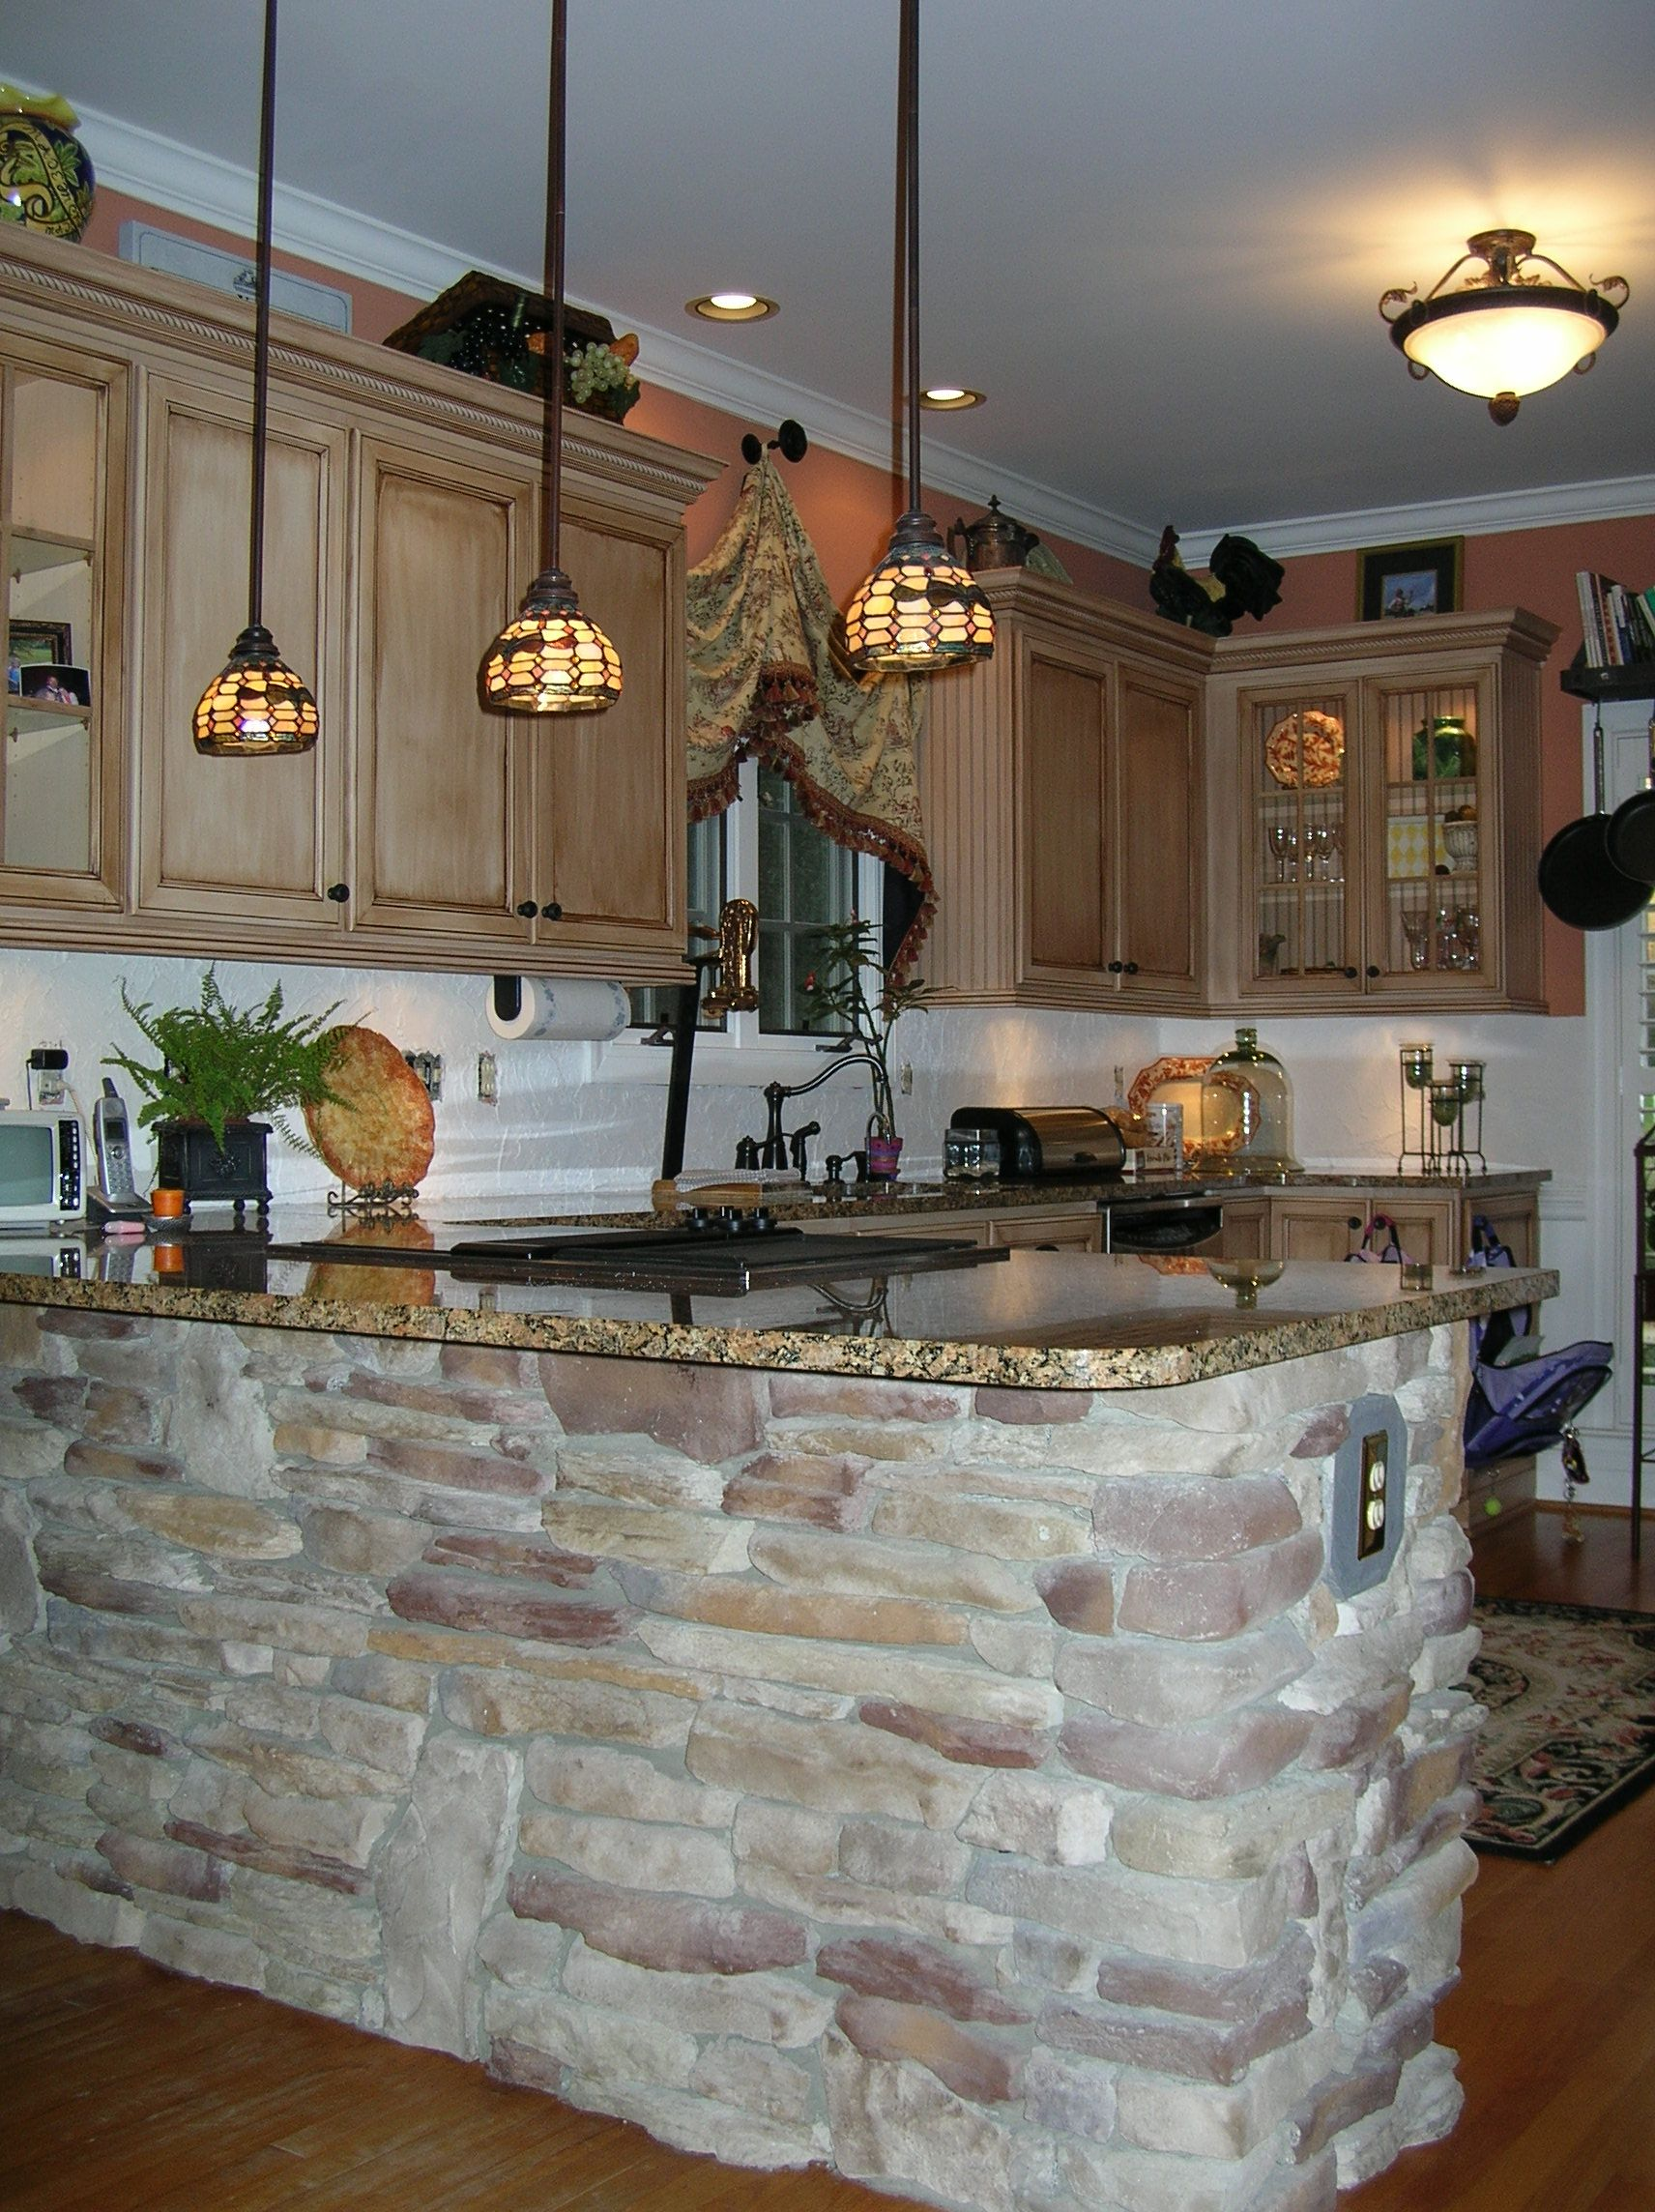 photos of rock and tile on interior kitchen bar kitchen bar accent dscn0973 malibu stone on kitchen interior tiles id=60887